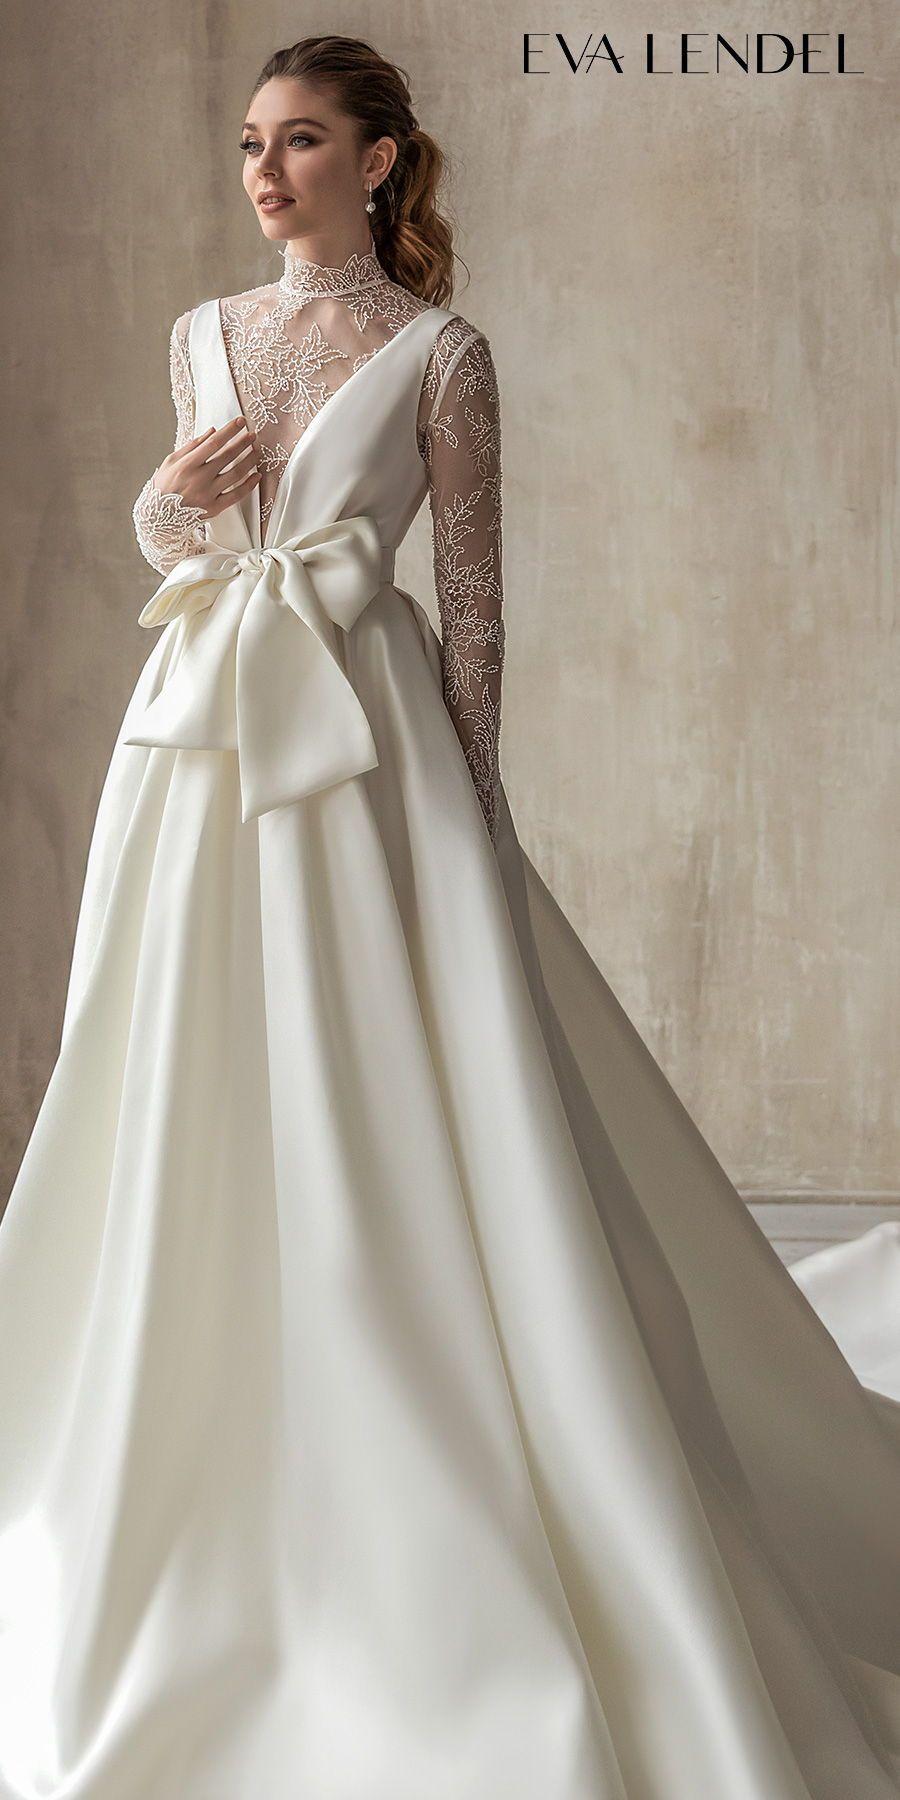 Eva Lendel 2021 Wedding Dresses Less Is More Bridal Collection Wedding Inspirasi Fashion Dresses Bridal Dresses Wedding Dresses